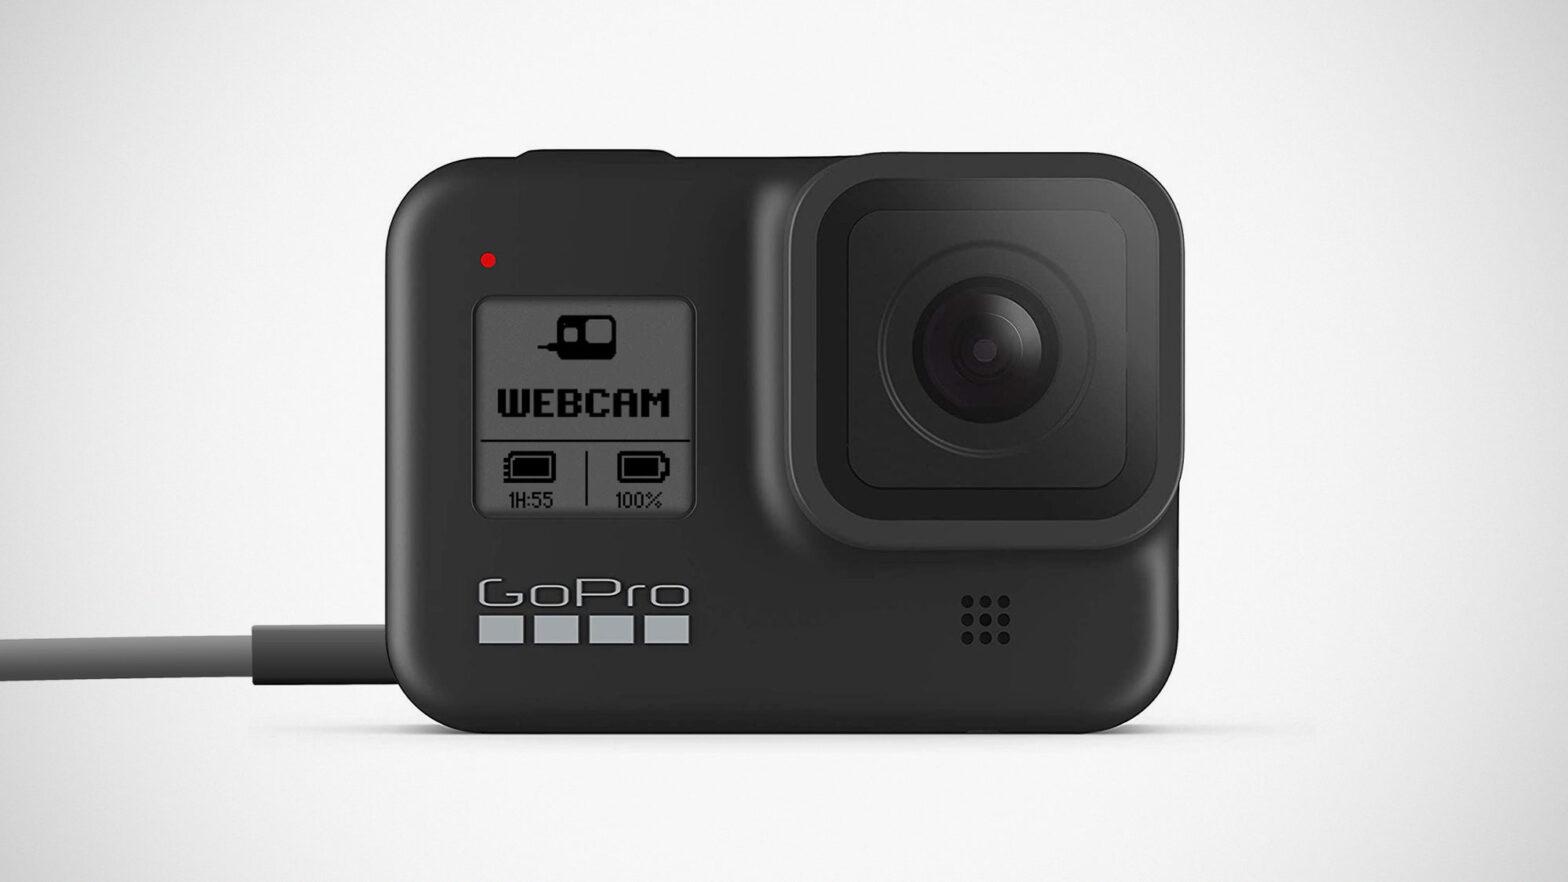 GoPro HERO8 Action Camera As a HD Webcam